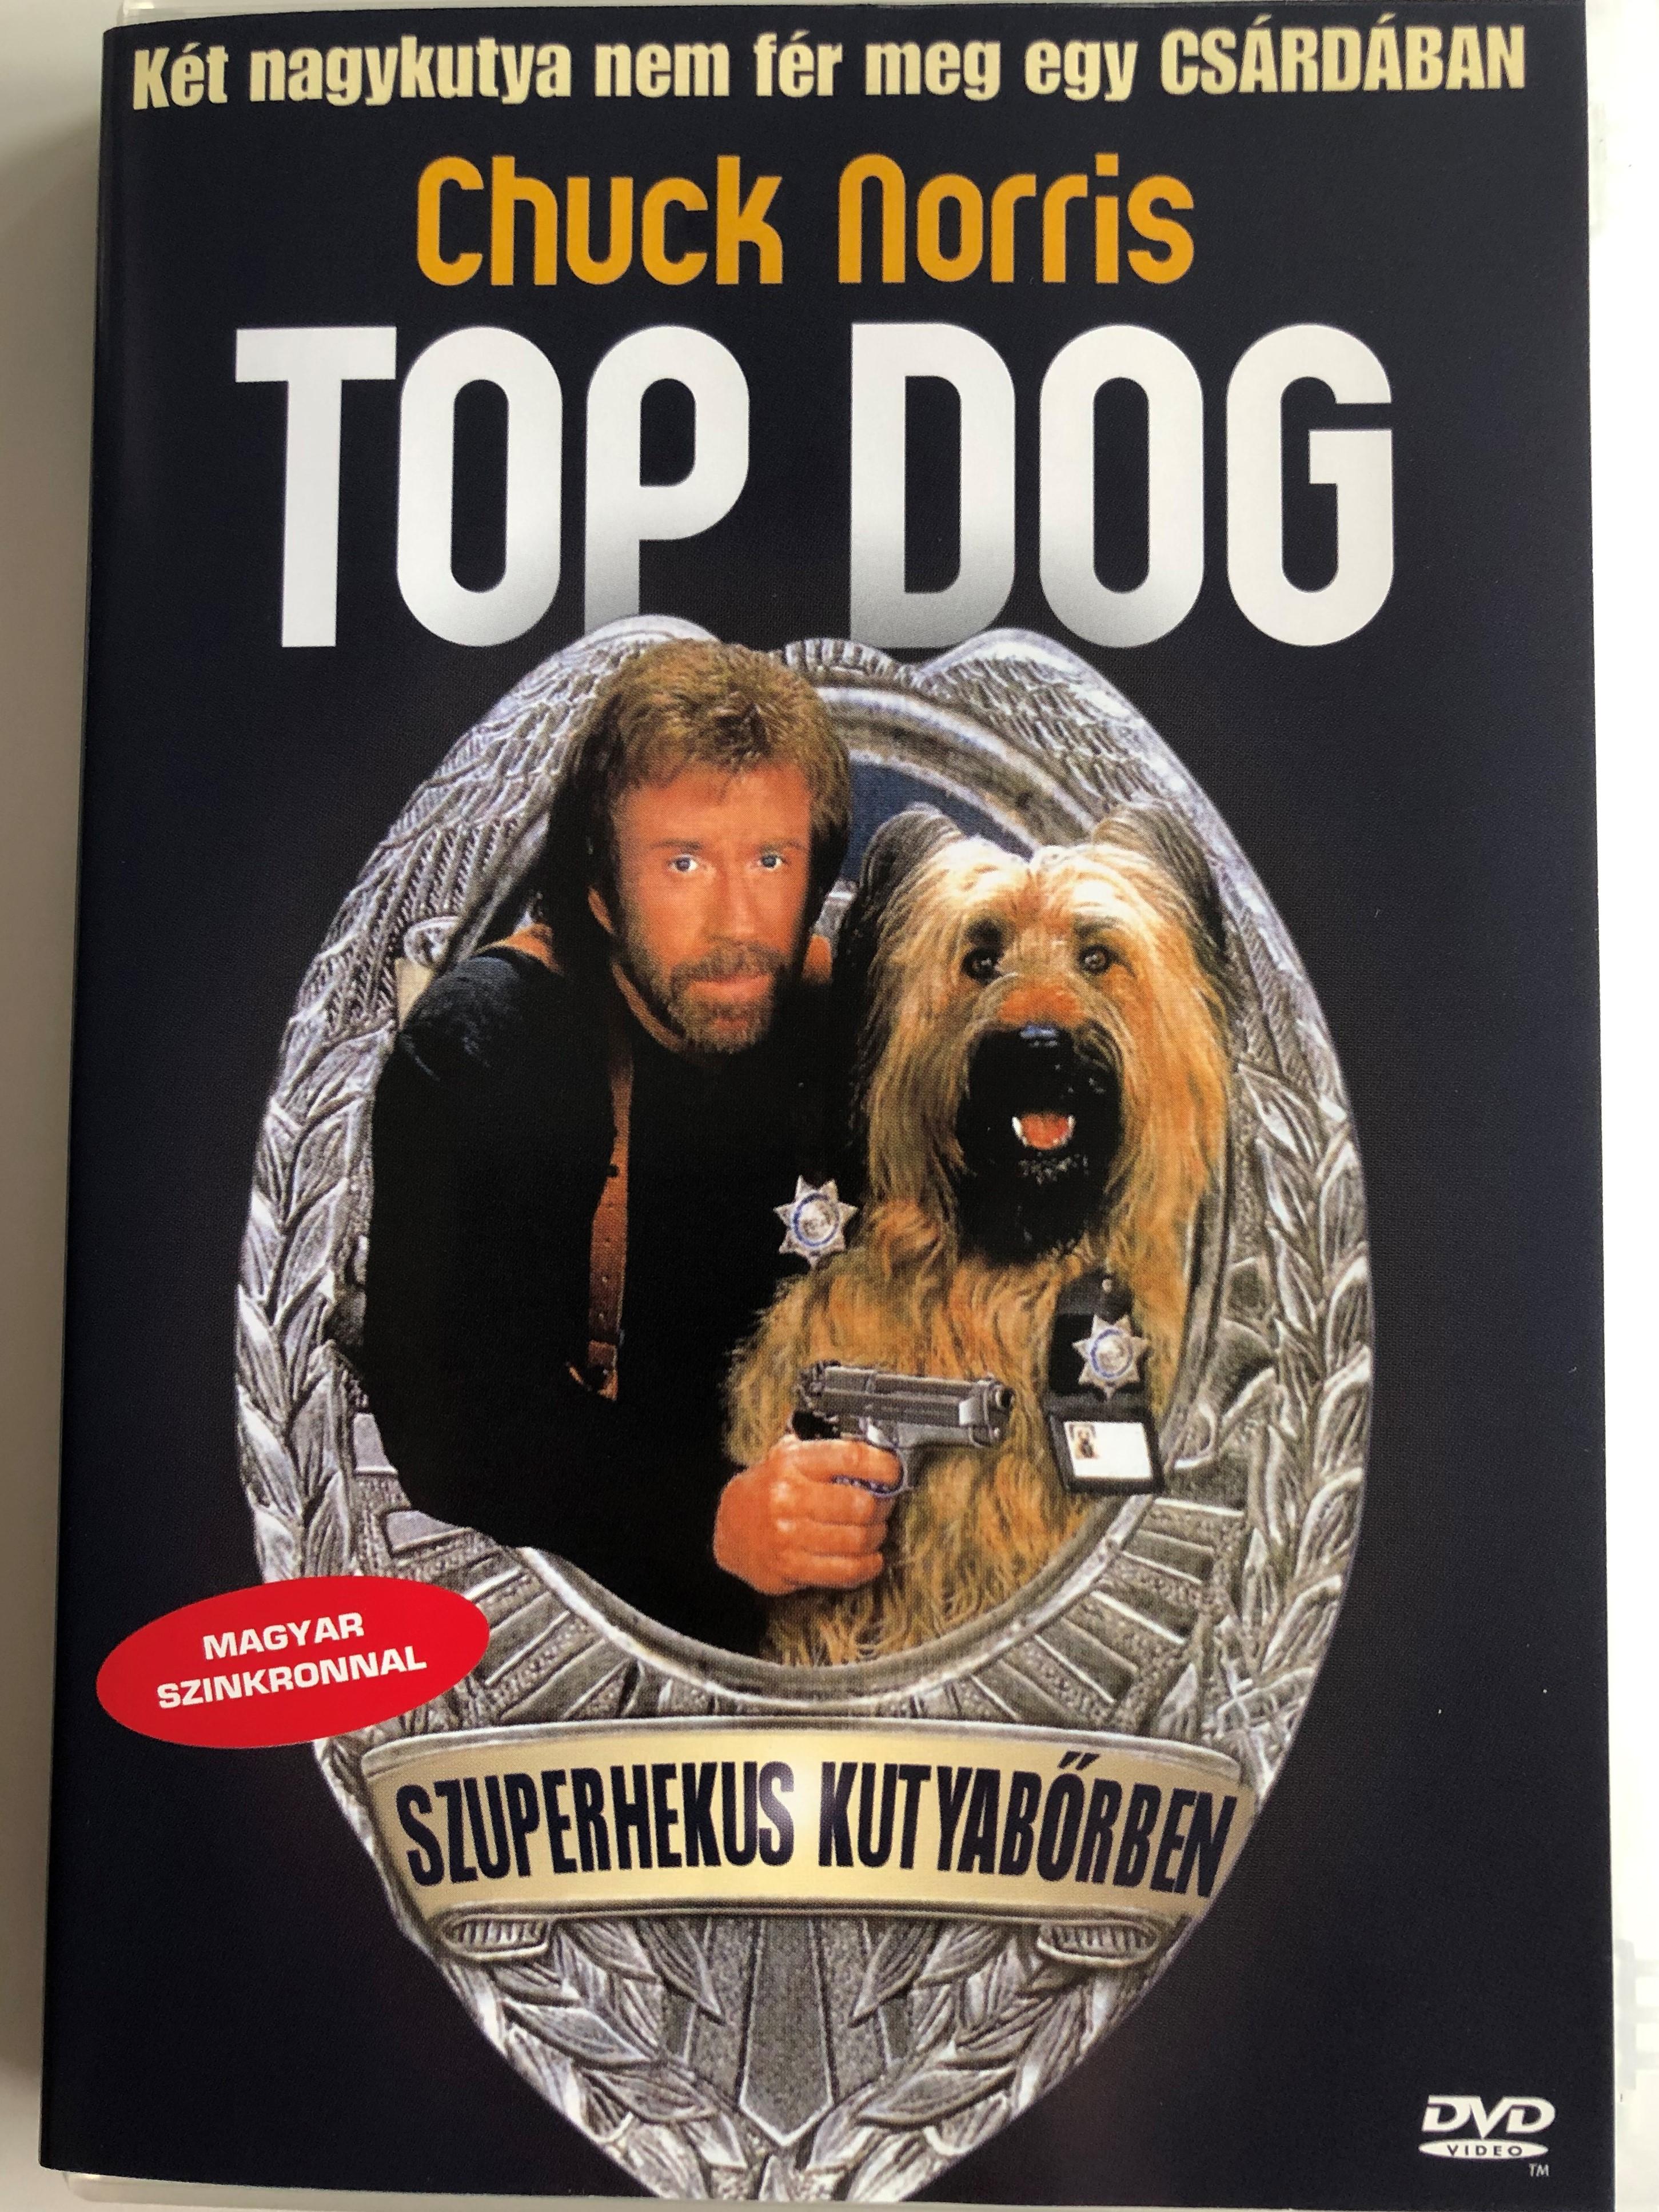 top-dog-dvd-1995-szuperhekus-kutyab-rben-1.jpg